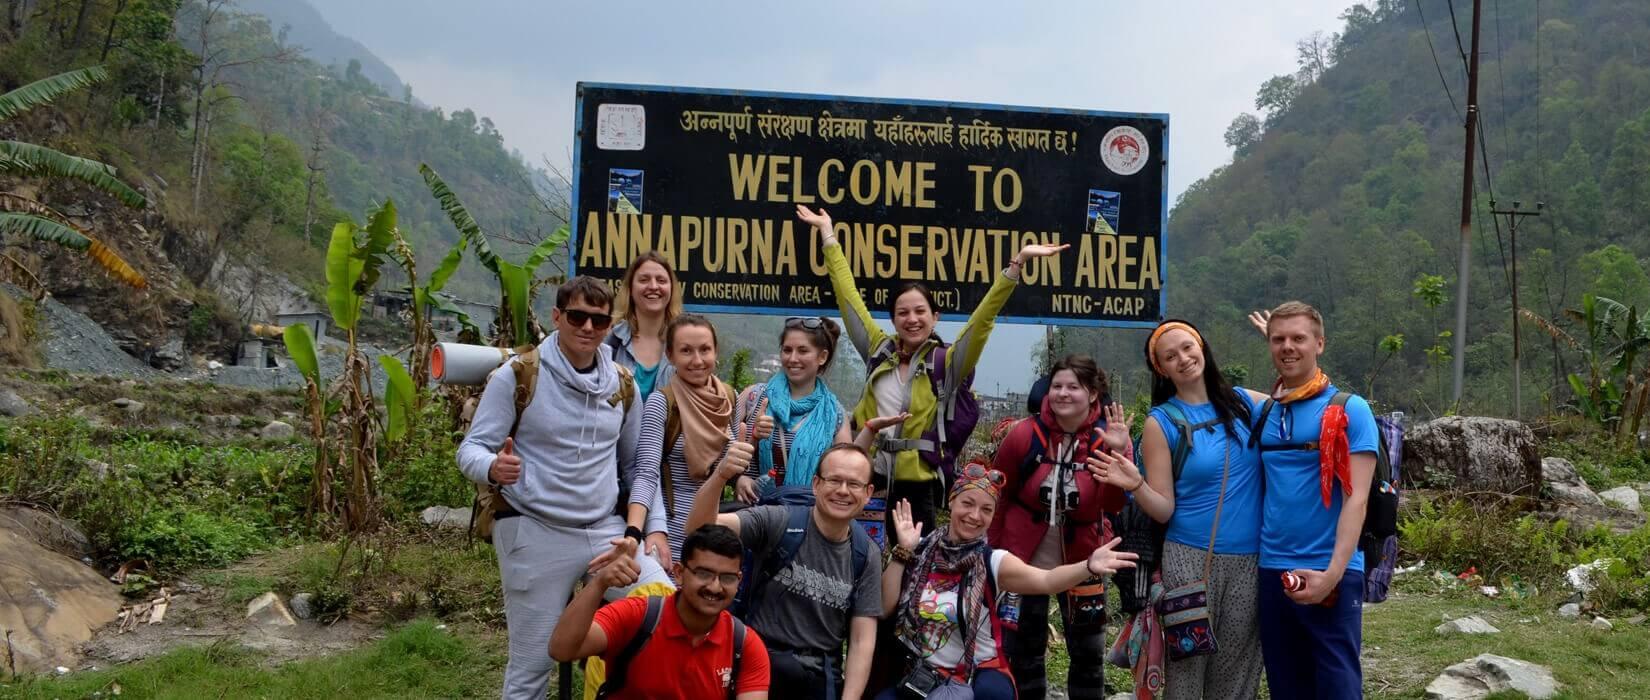 Amazing Annapurna Himalayas